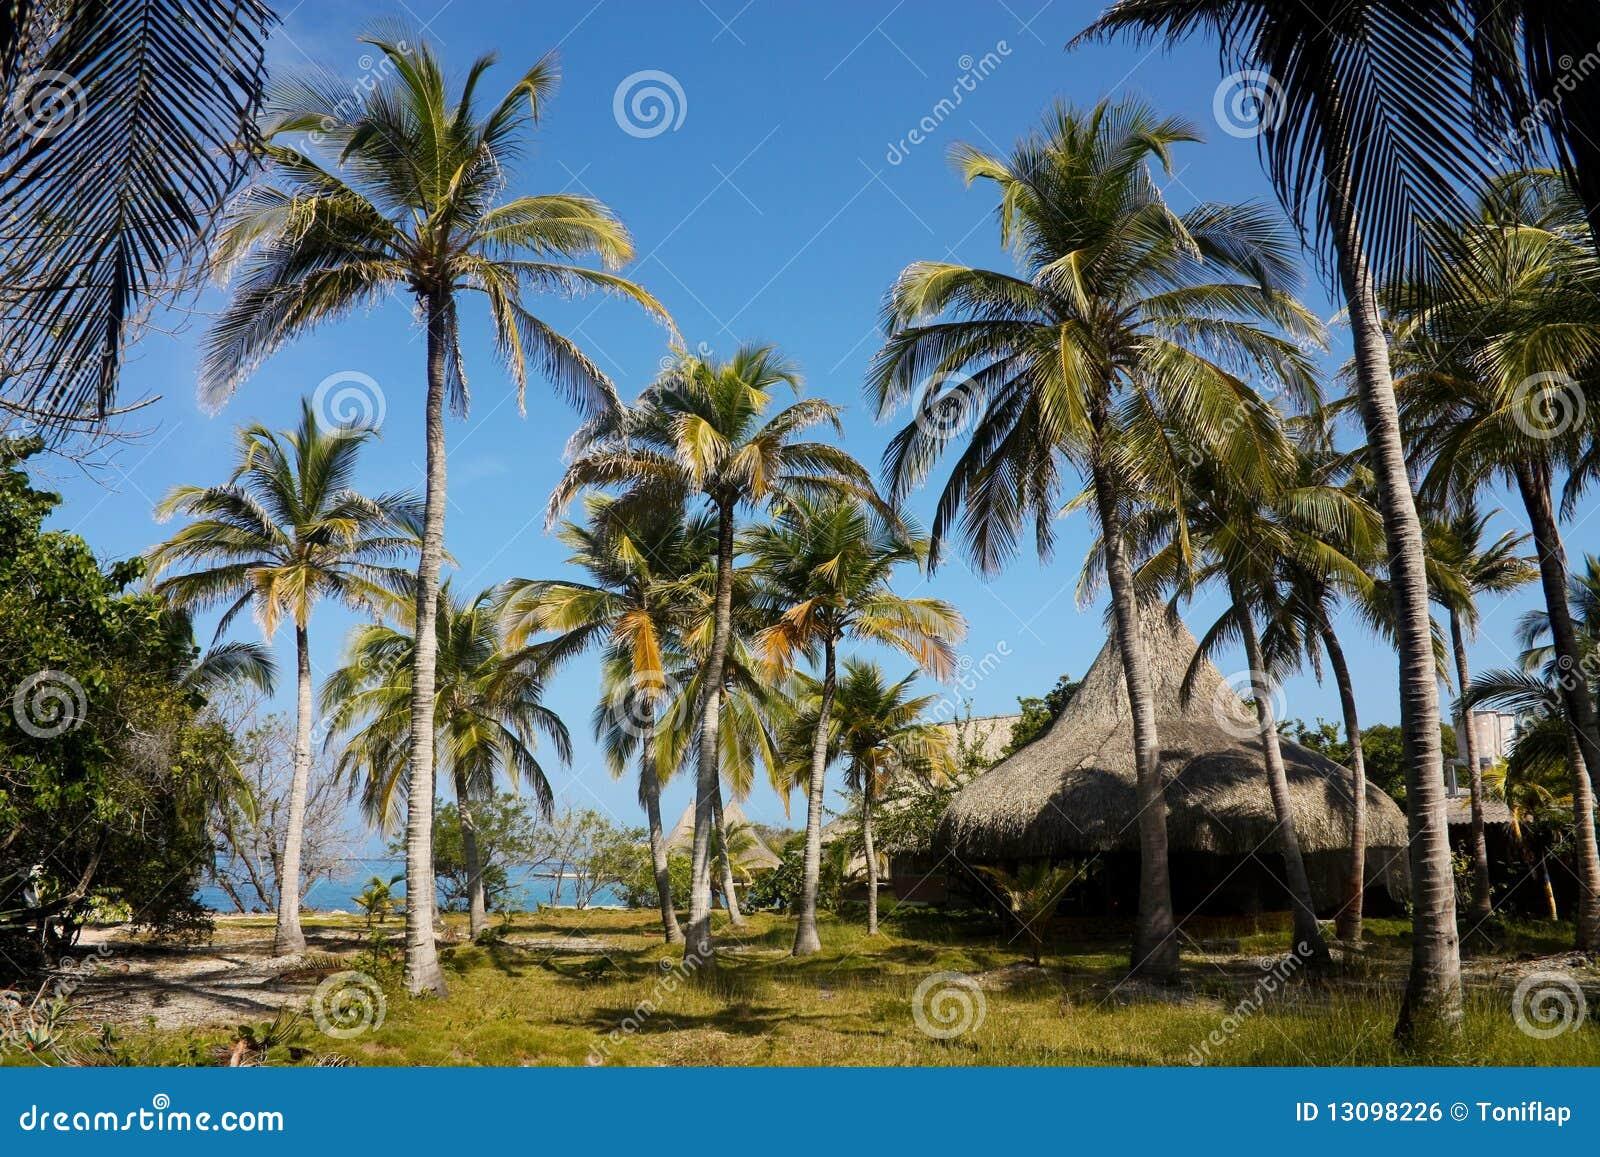 The Rosario Islands. Caribbean, Colombia